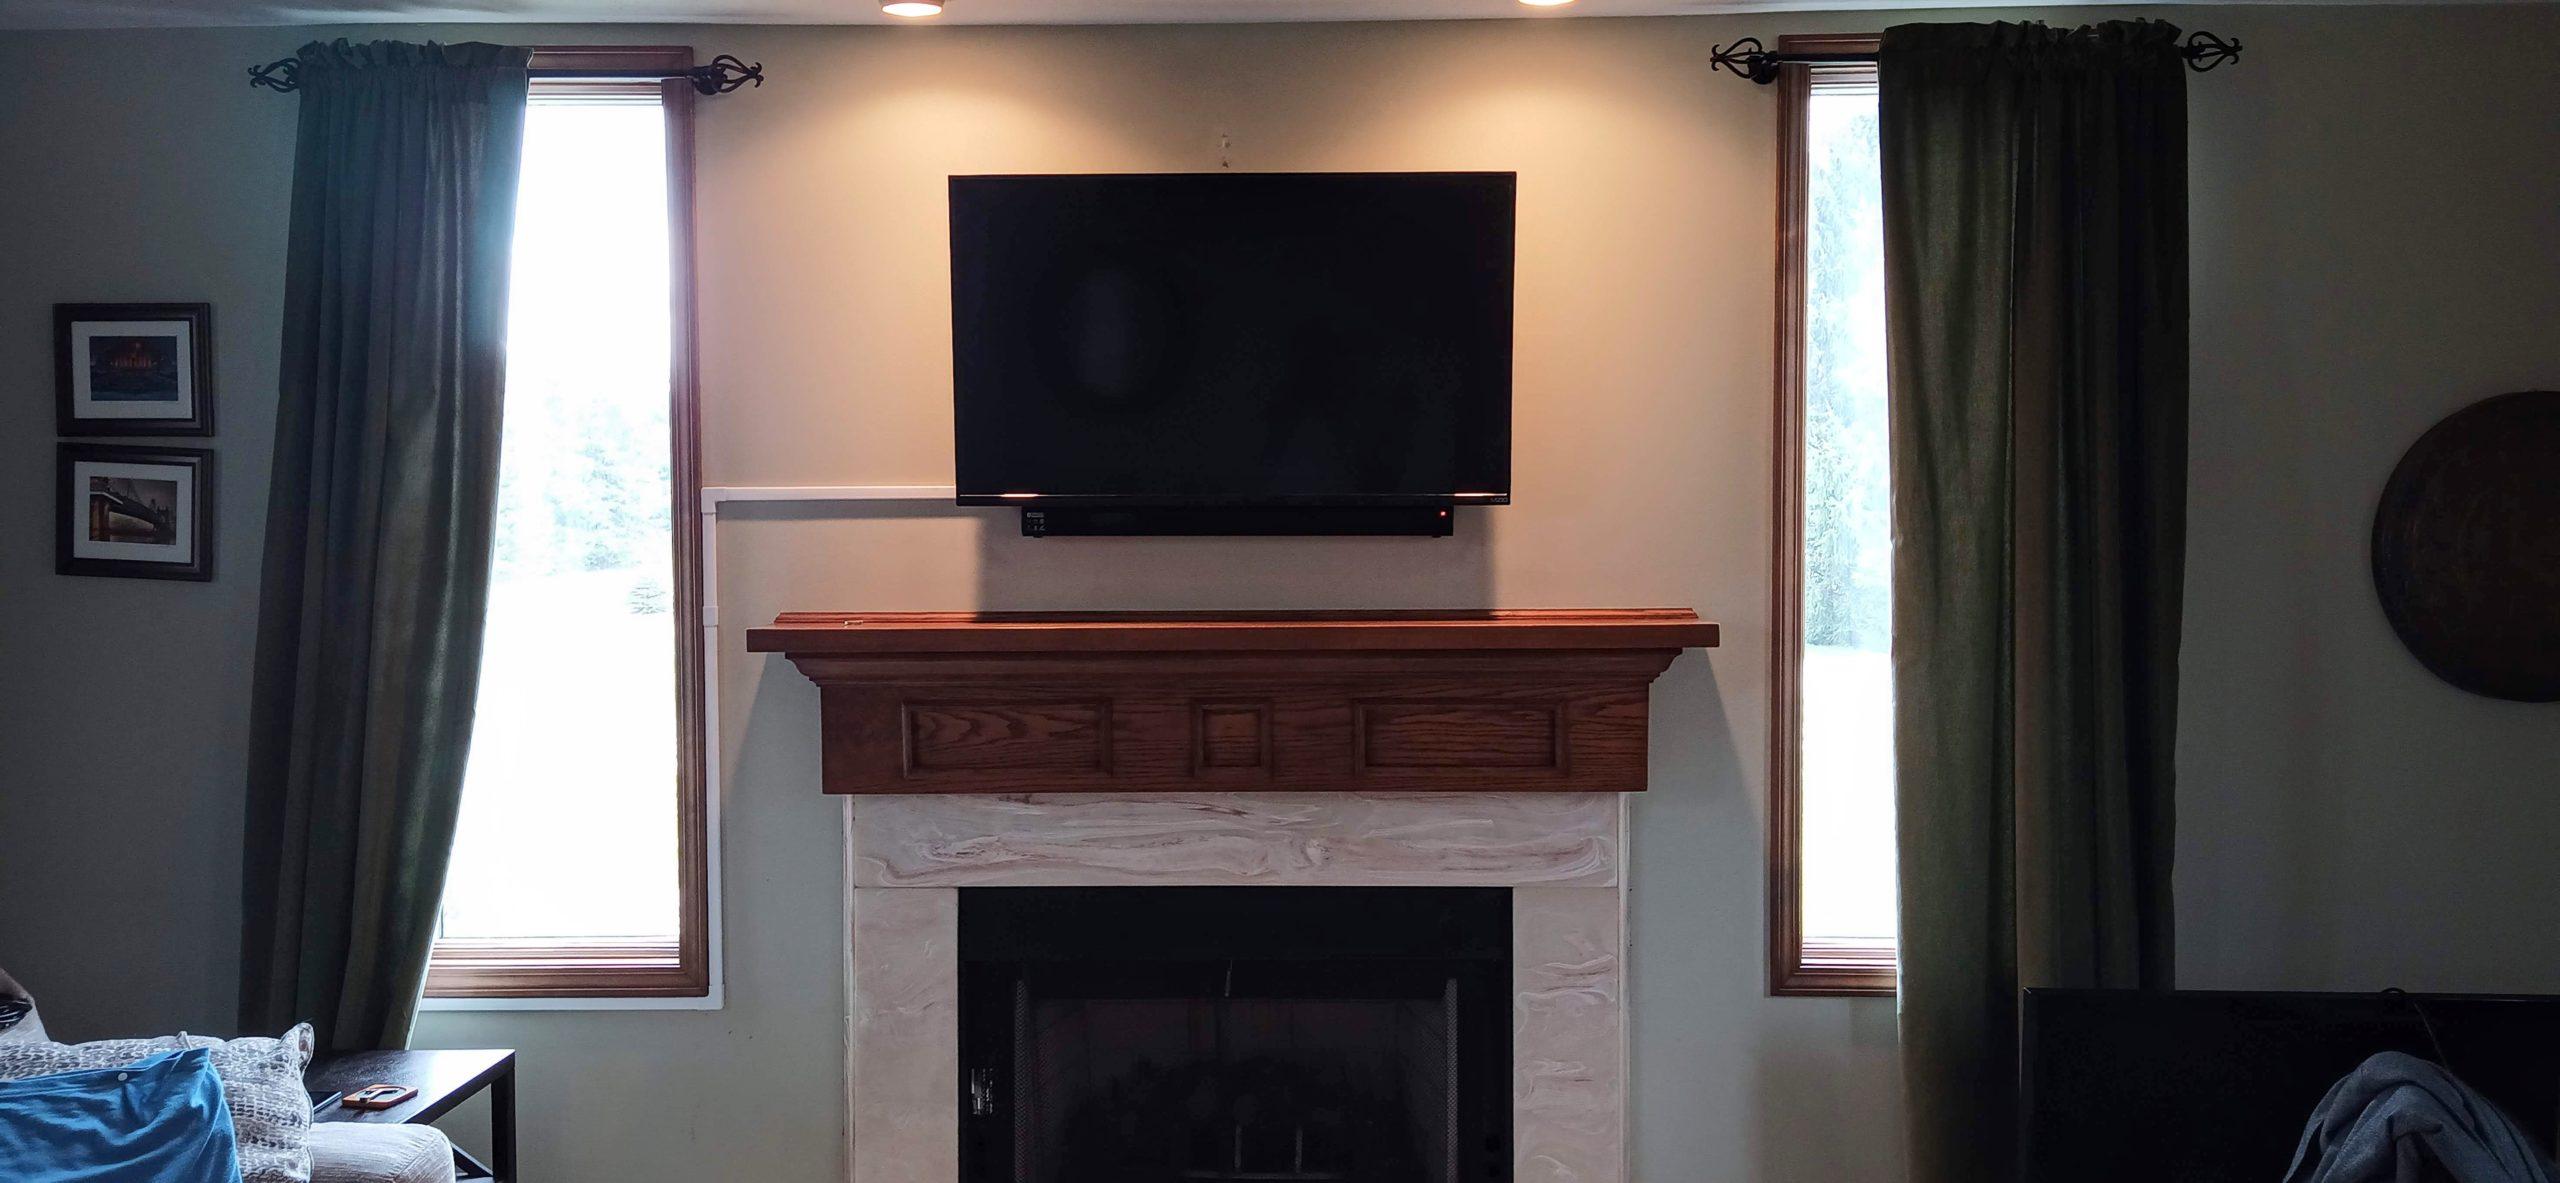 TV above fireplace installation